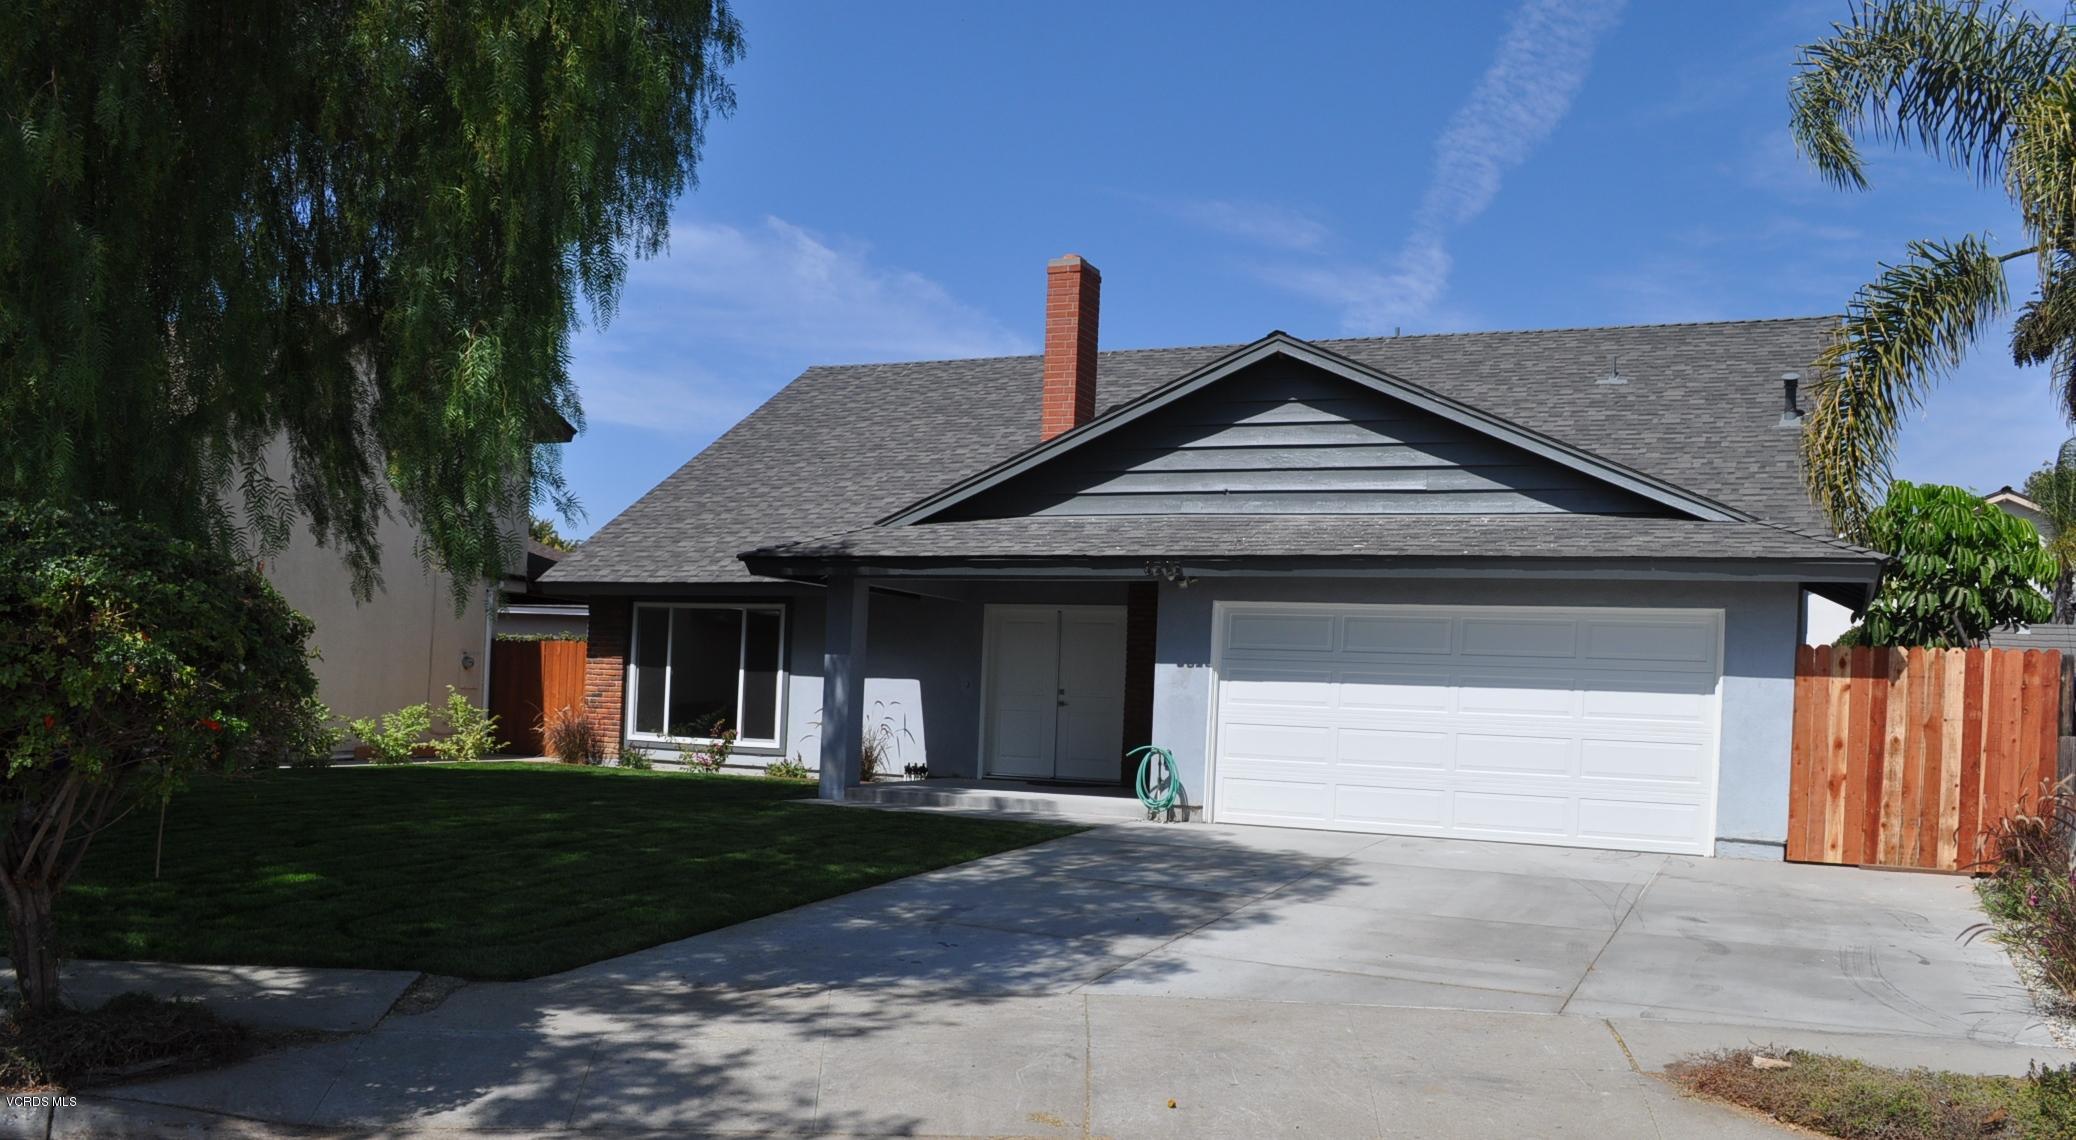 Single Family Home for Sale at 8525 Idyllwild Street 8525 Idyllwild Street Ventura, California 93004 United States